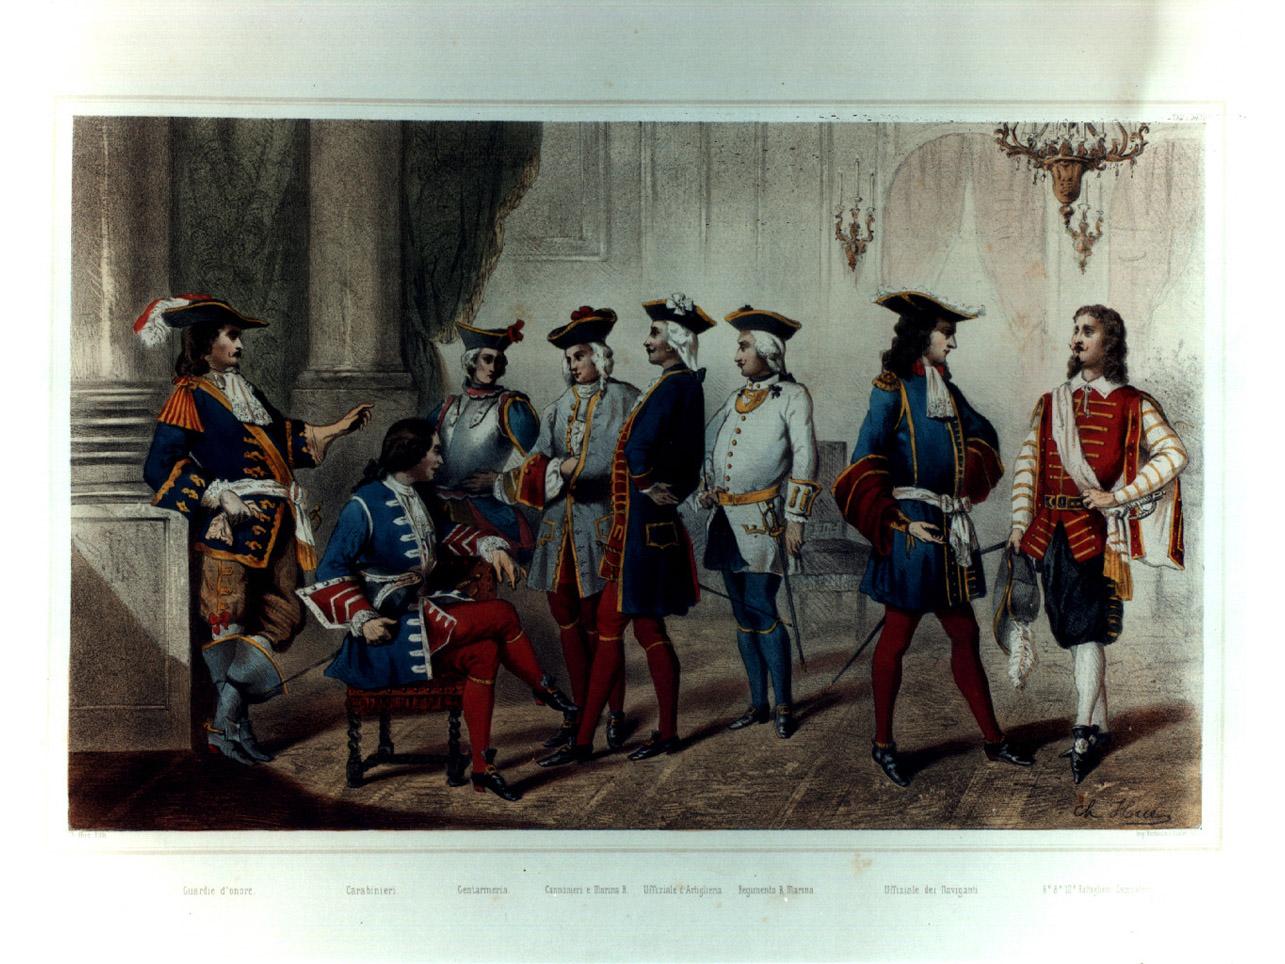 figure maschili in costumi militari entro salone (stampa a colori, elemento d'insieme) di Hue Charles Désiré (sec. XIX)